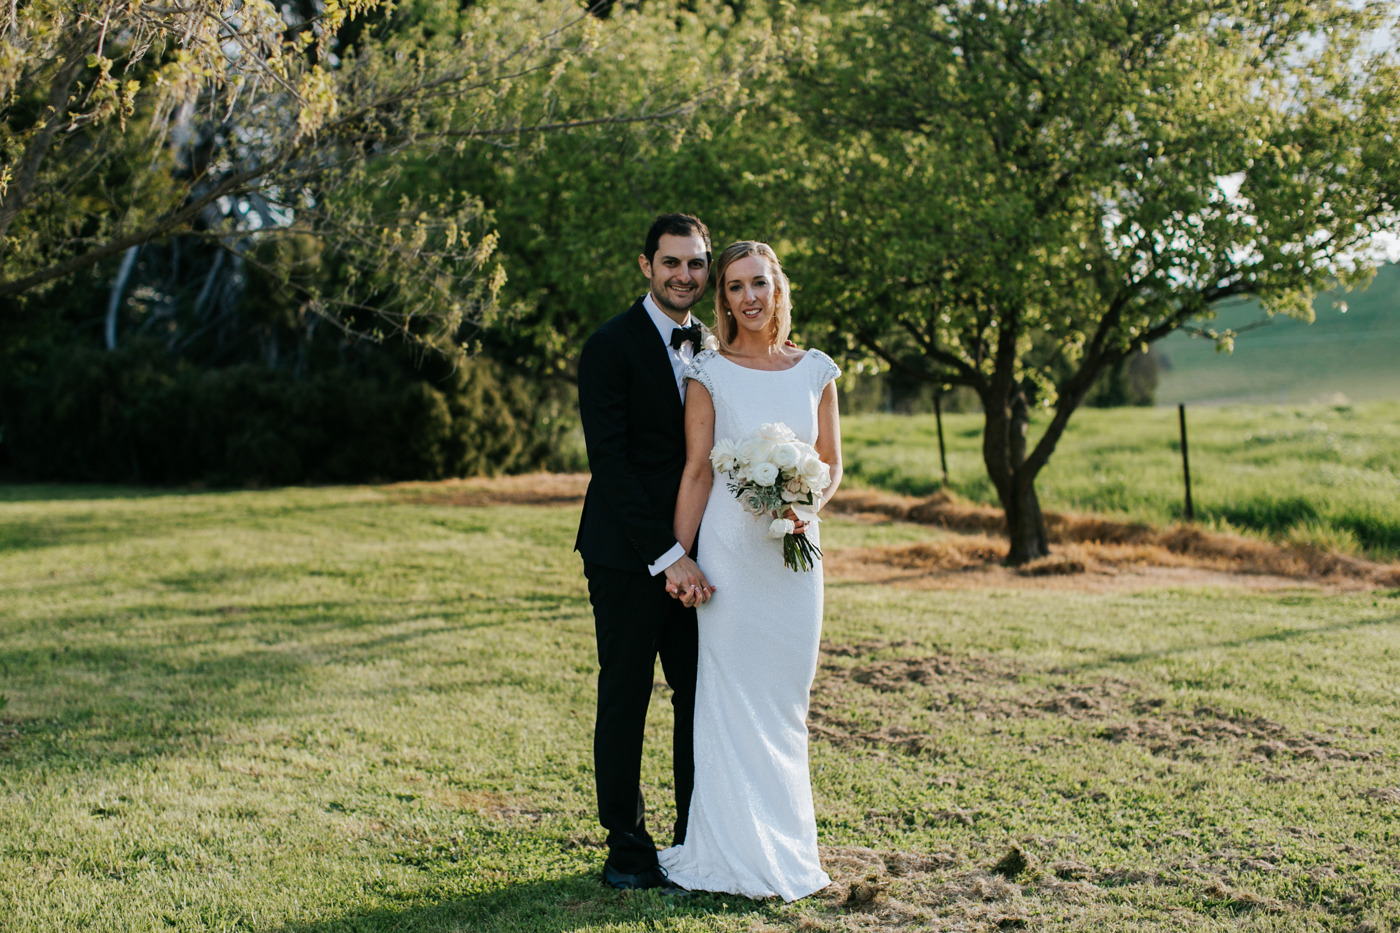 Bridget & James - Orange Country Wedding - Samantha Heather Photography-134.jpg